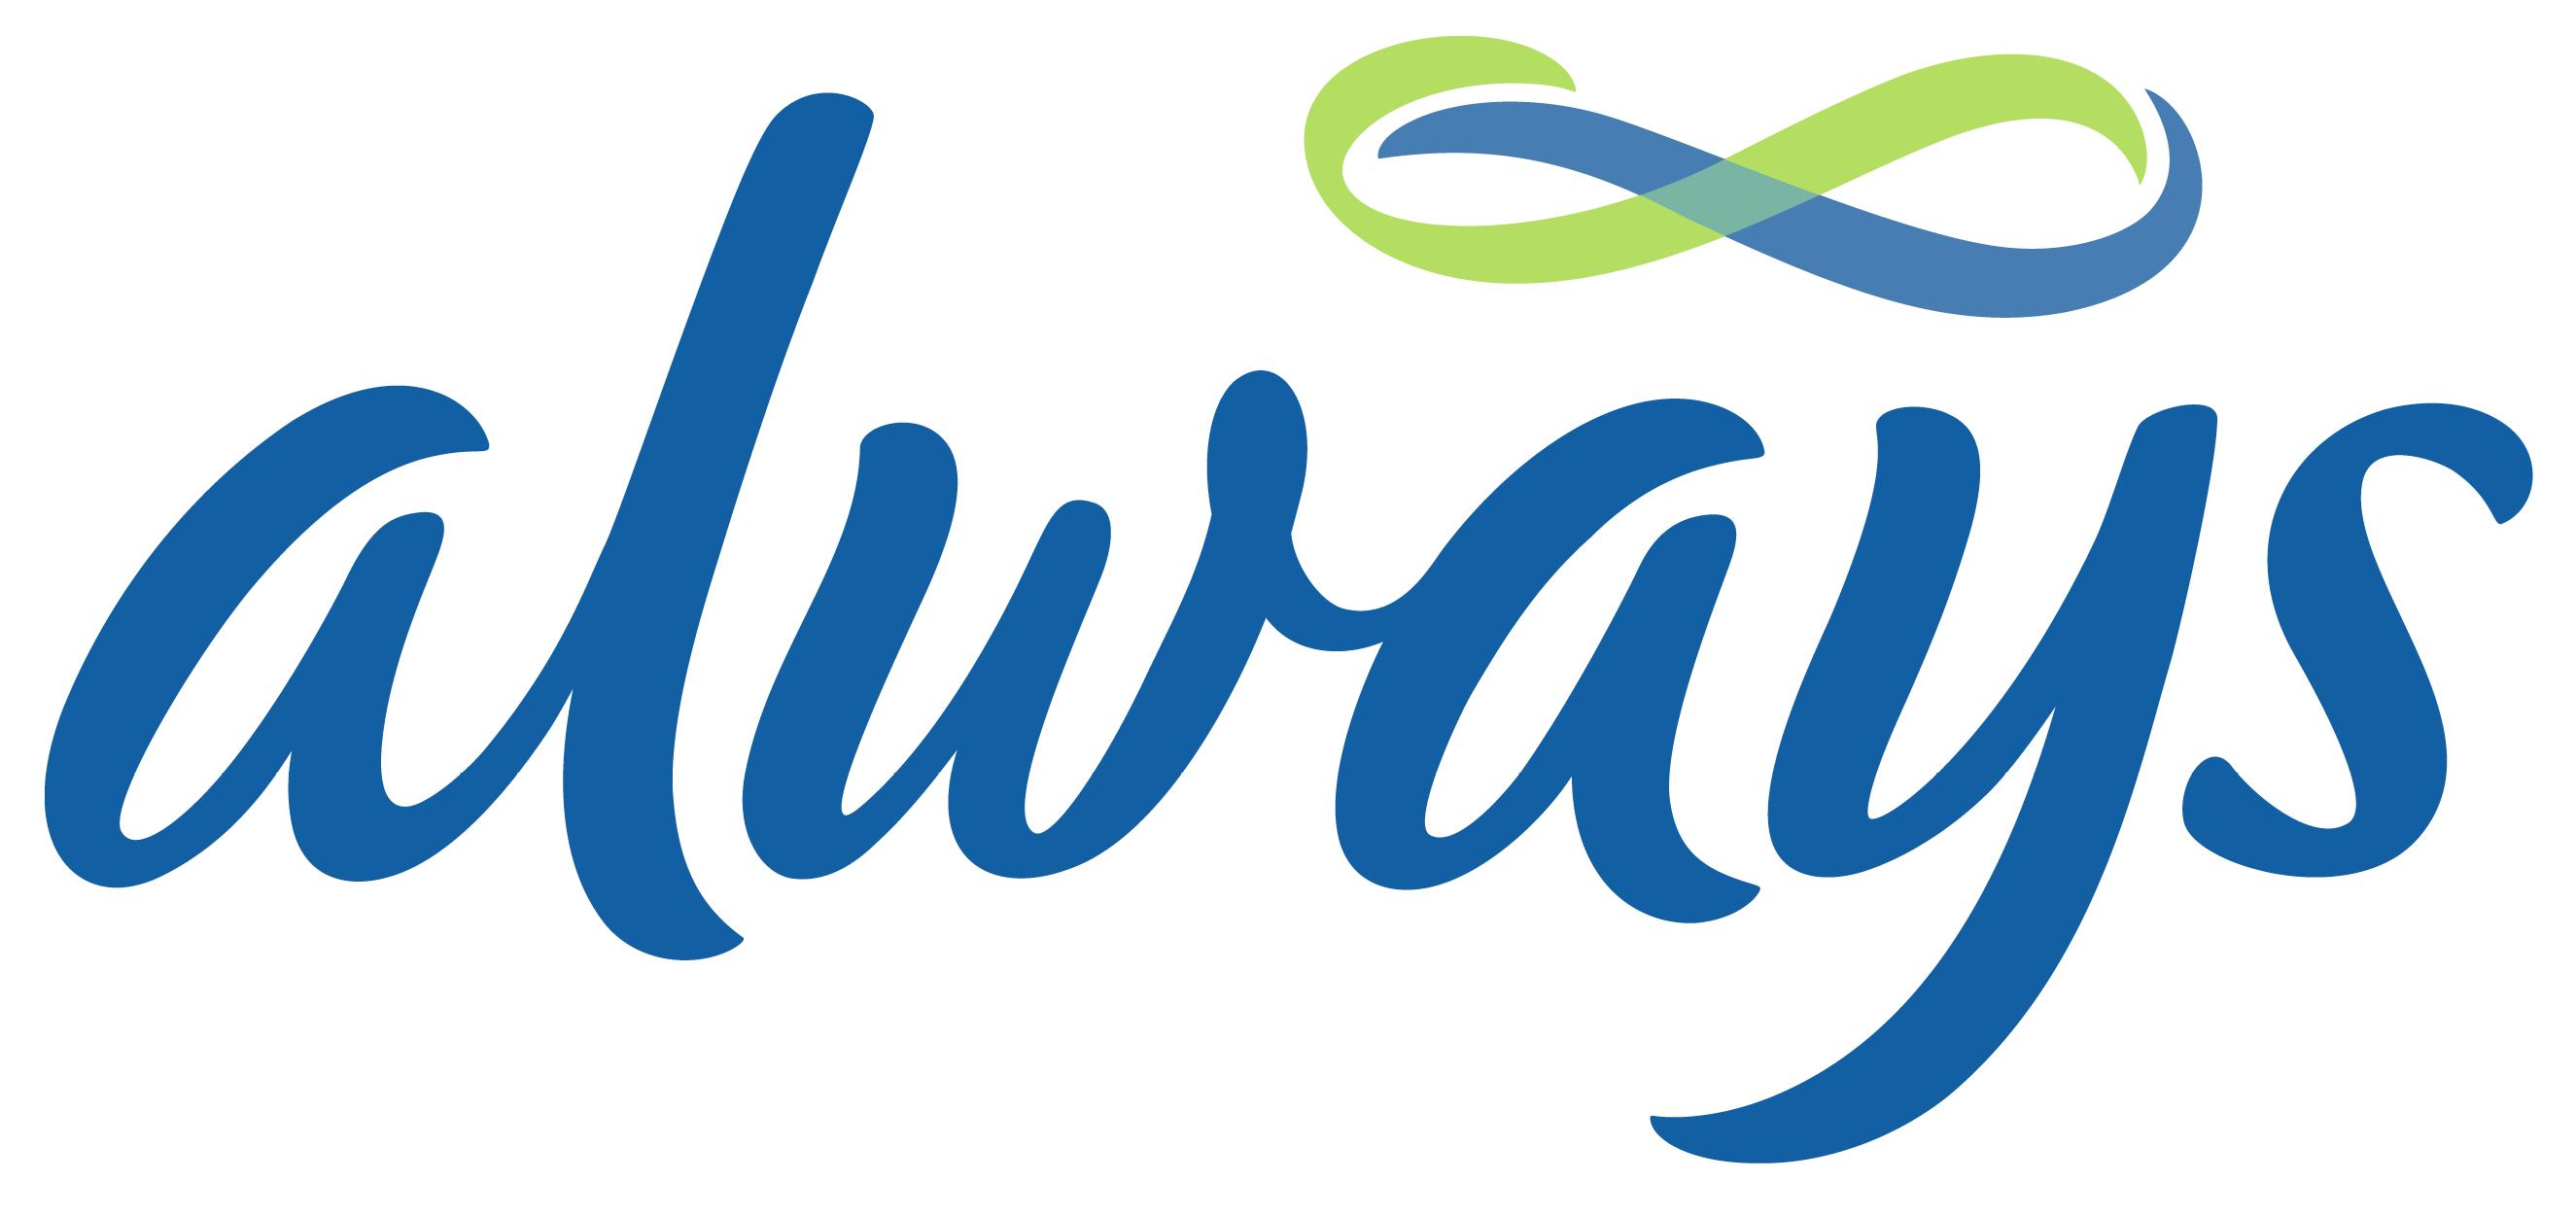 Always logo, logotype, emblem